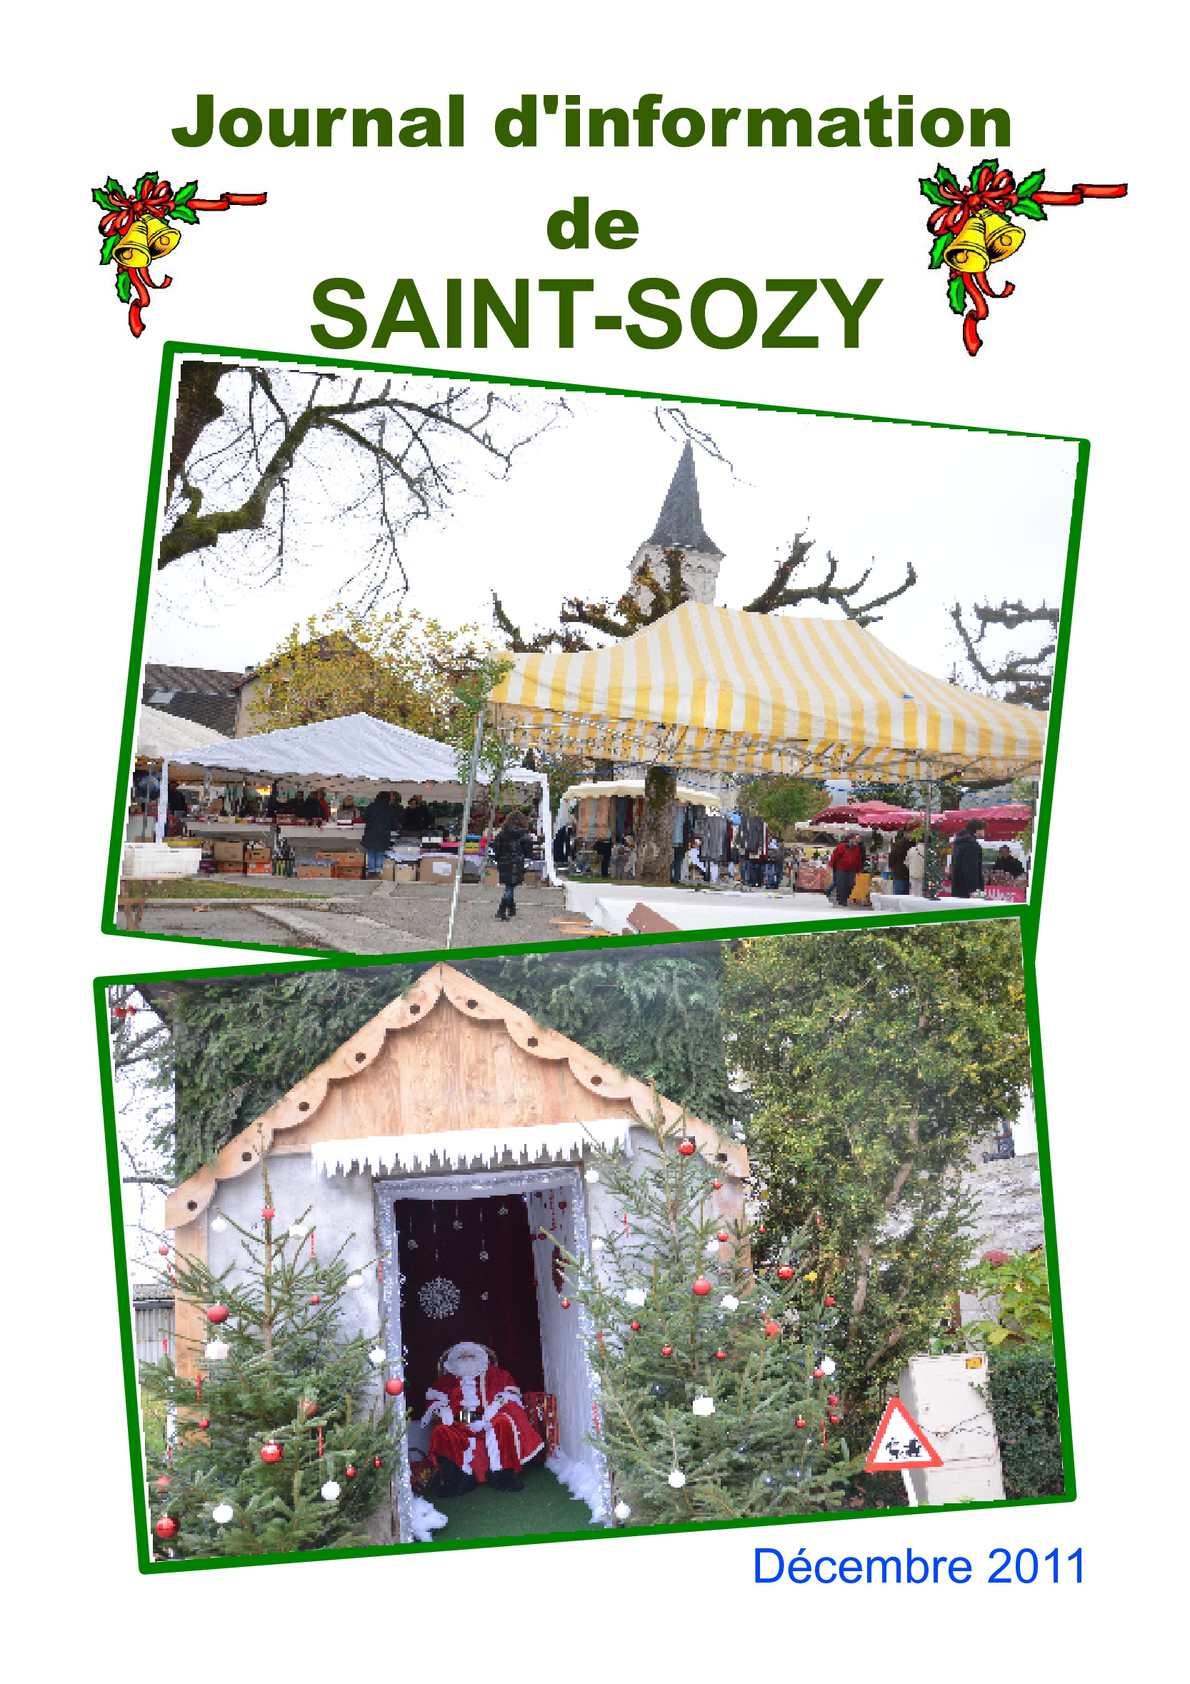 Hotel St Sozy